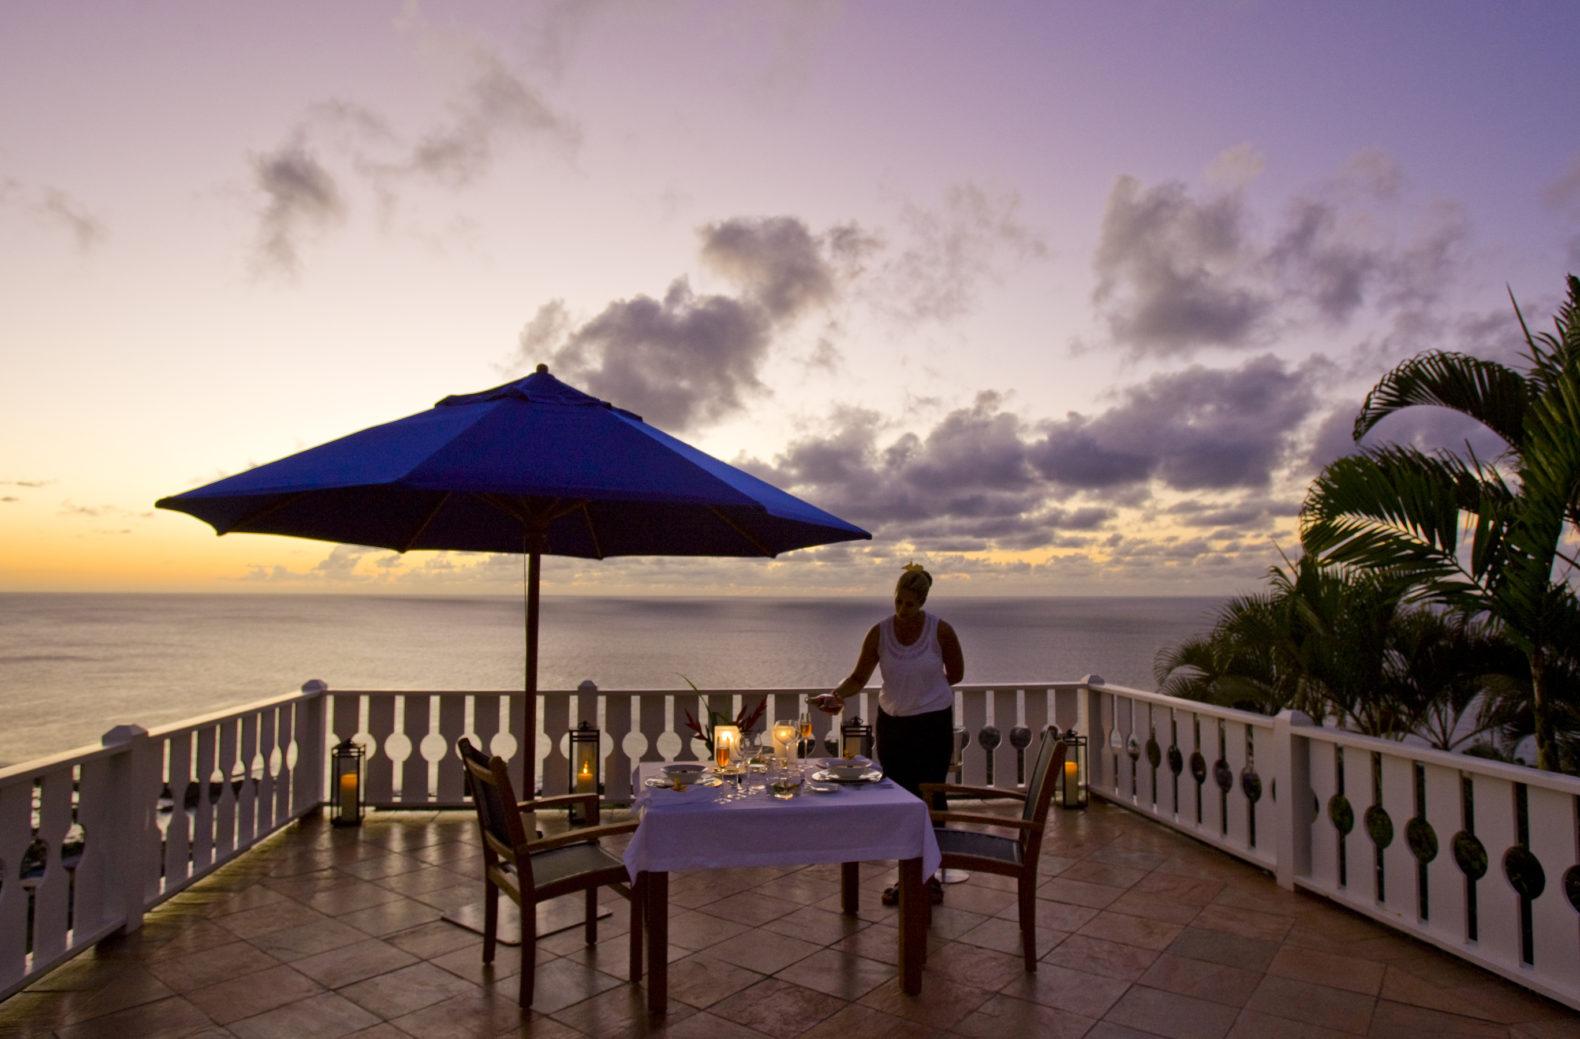 sundeck-romantic-dinner-sunset-candlelight-the-sullivan-estate-jk7-spa-retreat-usa